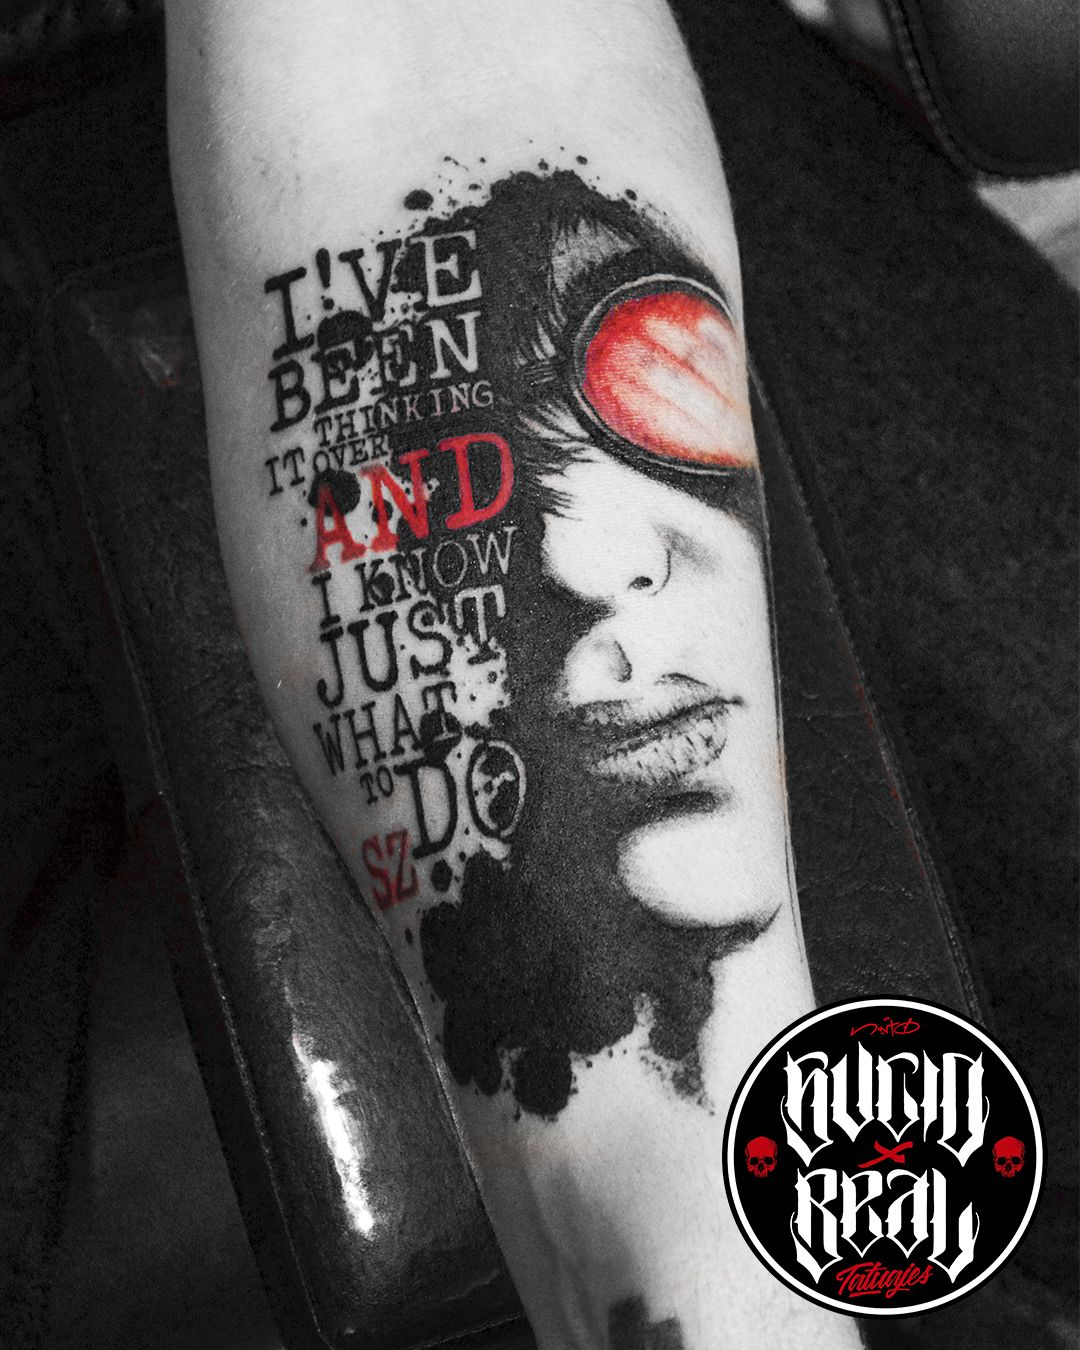 Joey Ramone Tattoo Tattoo Tattoos Ramones Joey Ramone